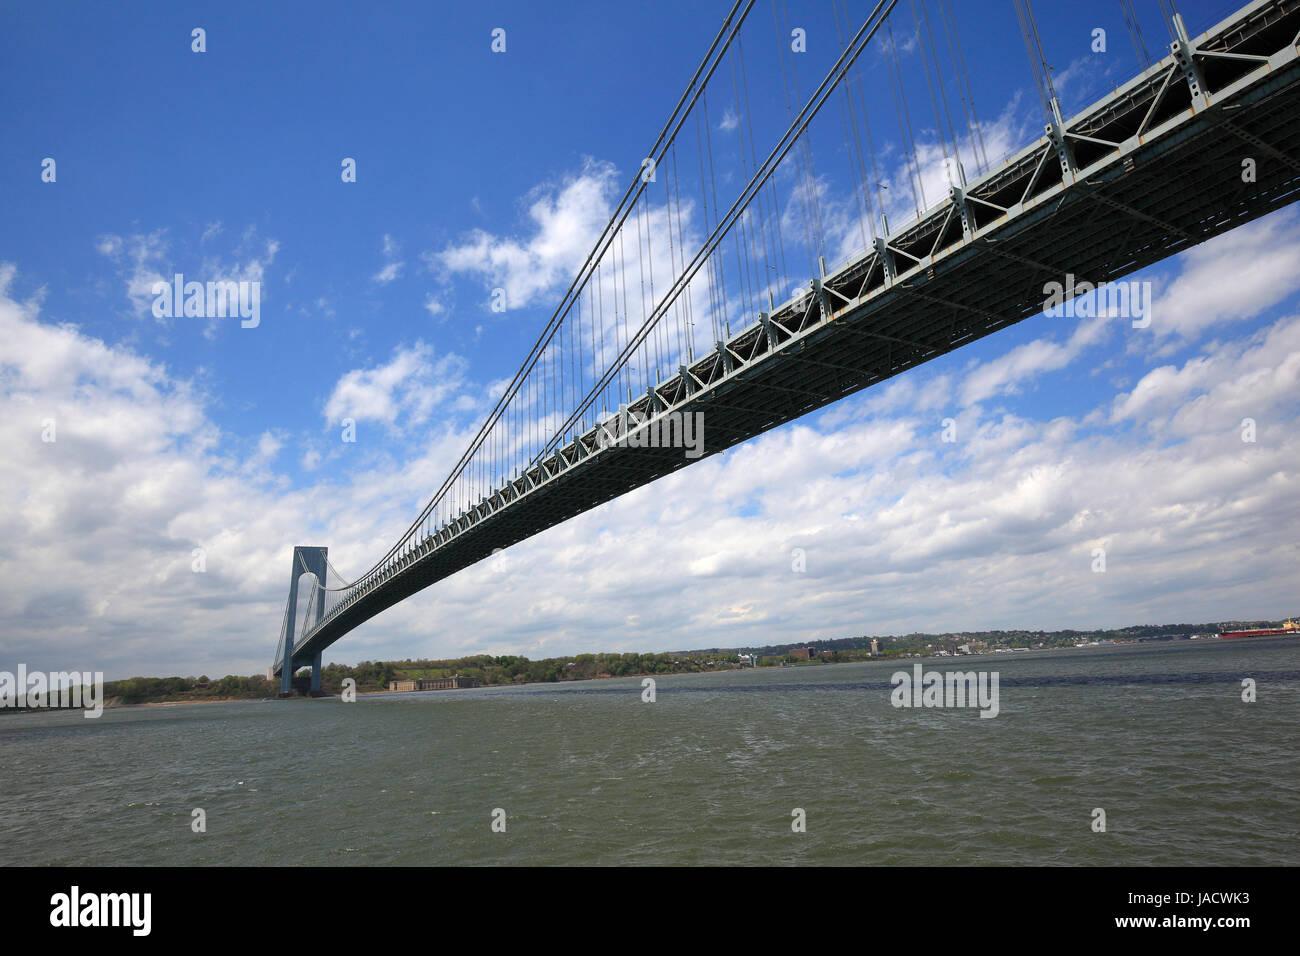 Verrazano-Narrows Bridge in New York City - Stock Image